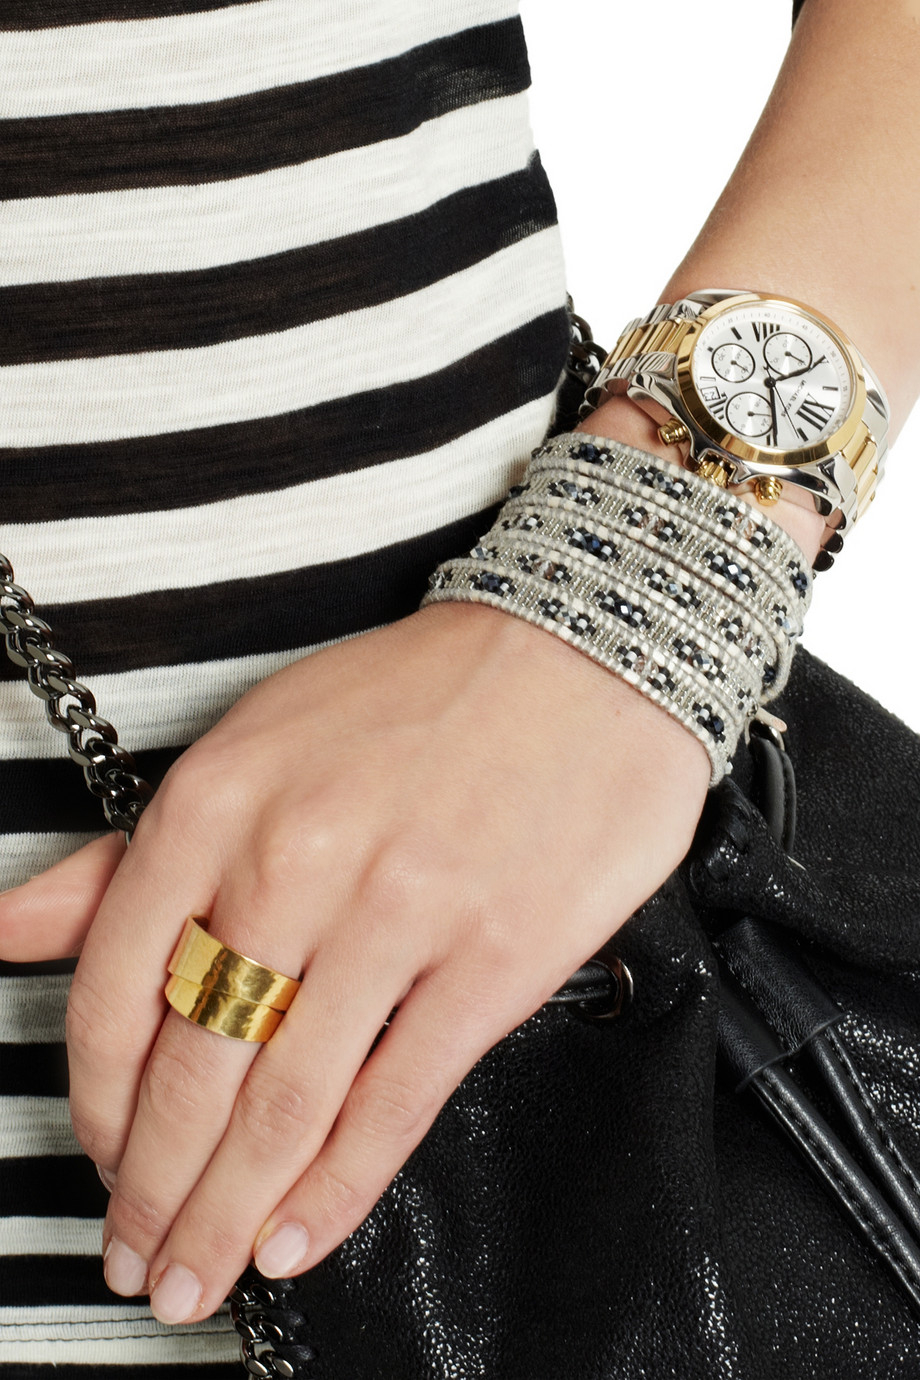 Lyst Michael Kors Bradshaw Gold And SilverTone Chronograph Watch